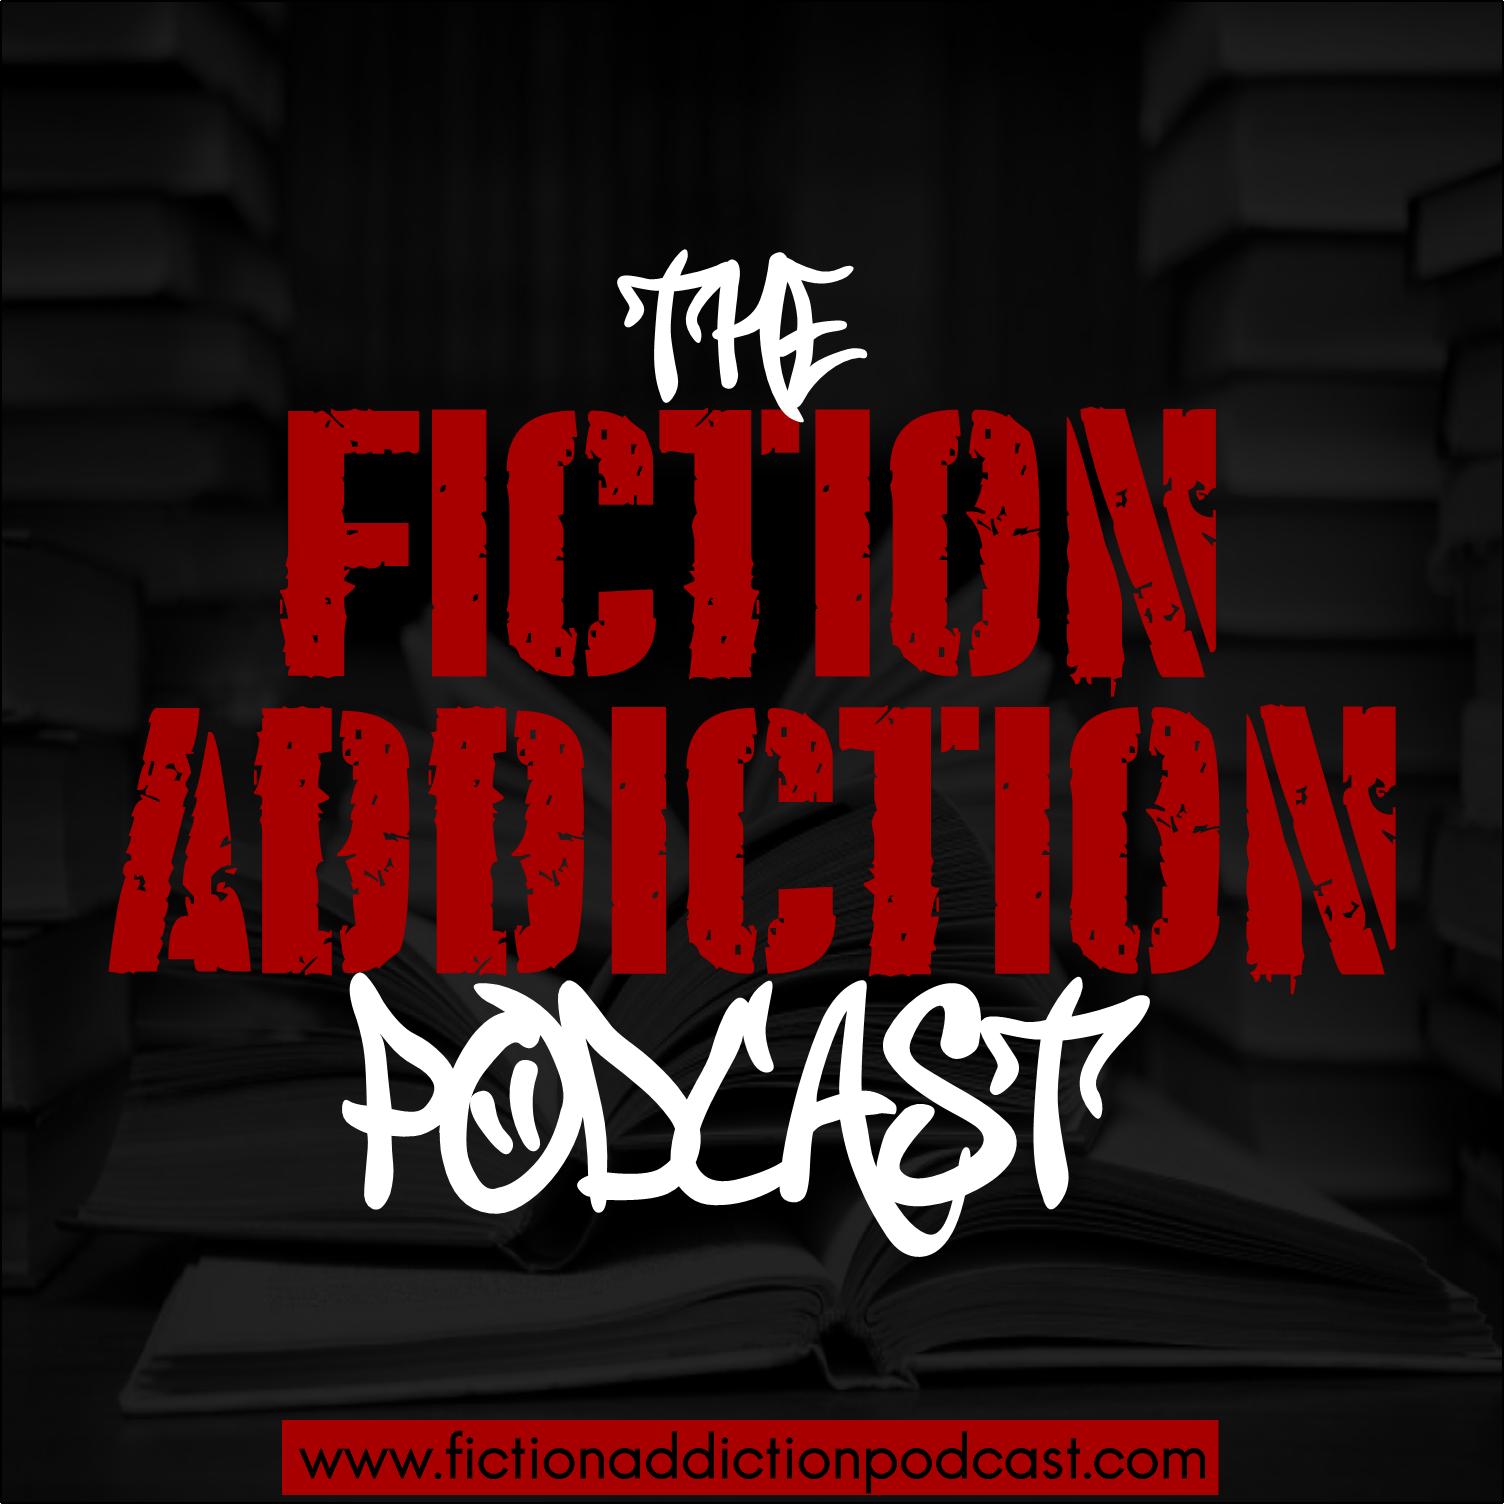 The Fiction Addiction Podcast